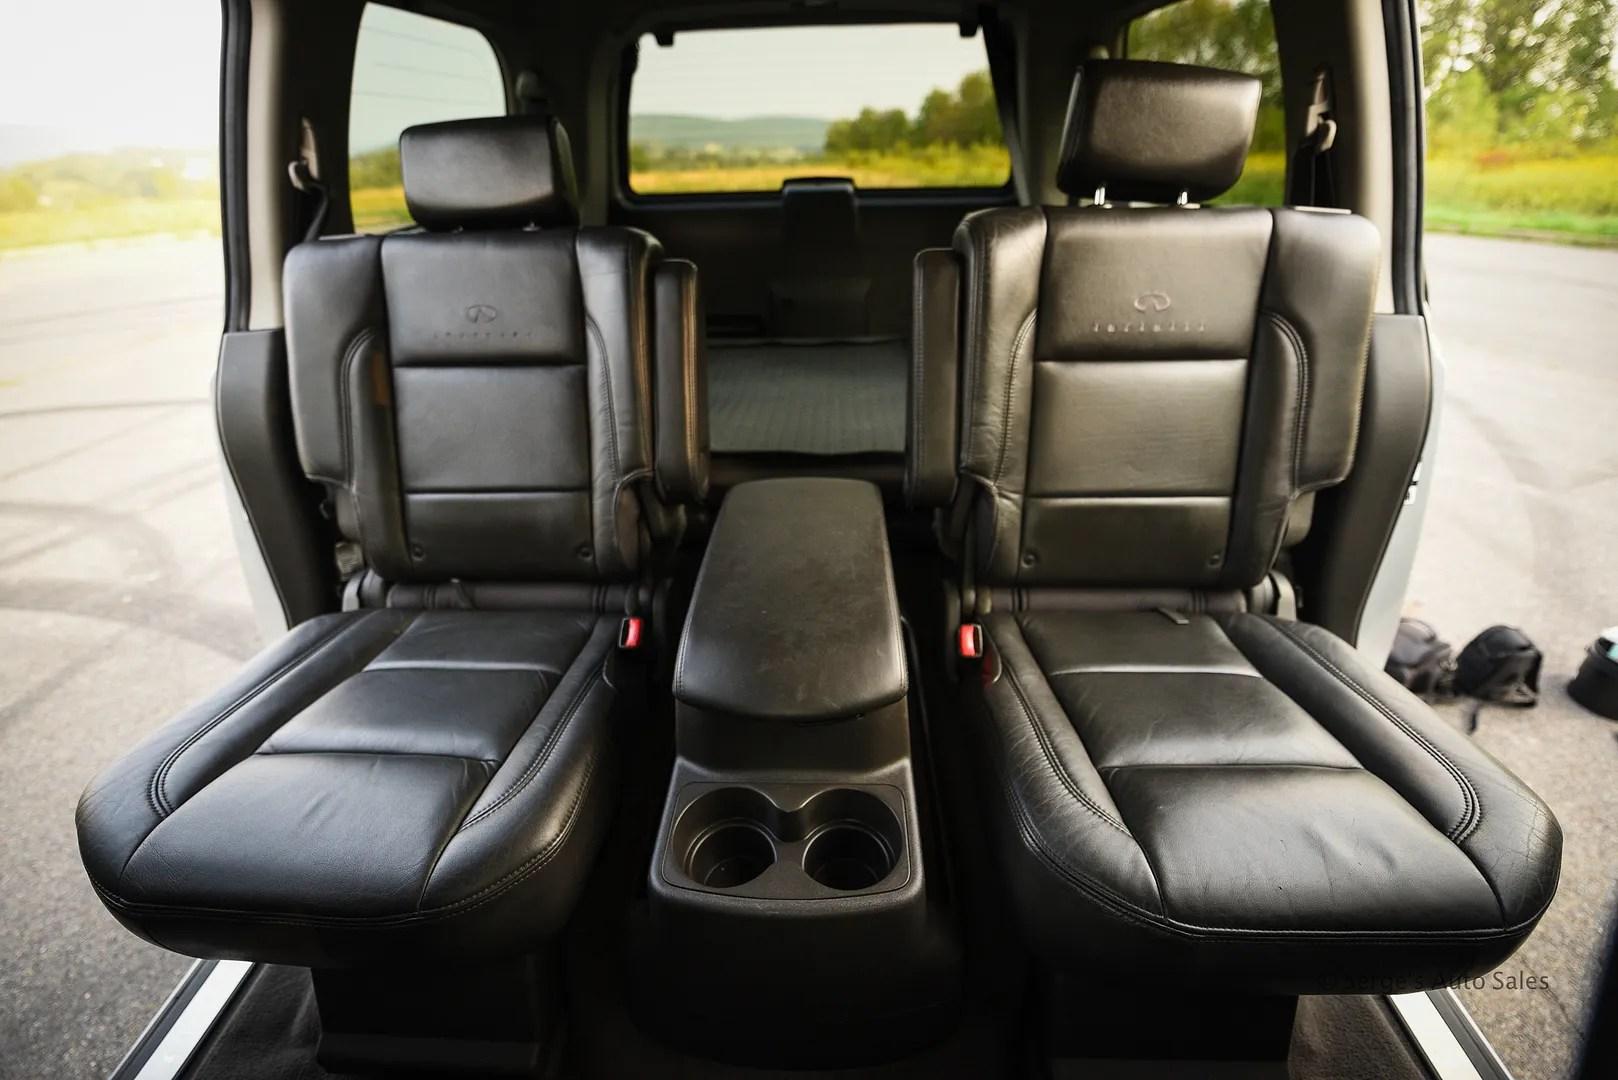 photo Infiniti-Serges-Auto-Sales-Car-dealer-Pennsylvania-QX56-Scranton-Nepa-51_zpsmrnhi7bd.jpg